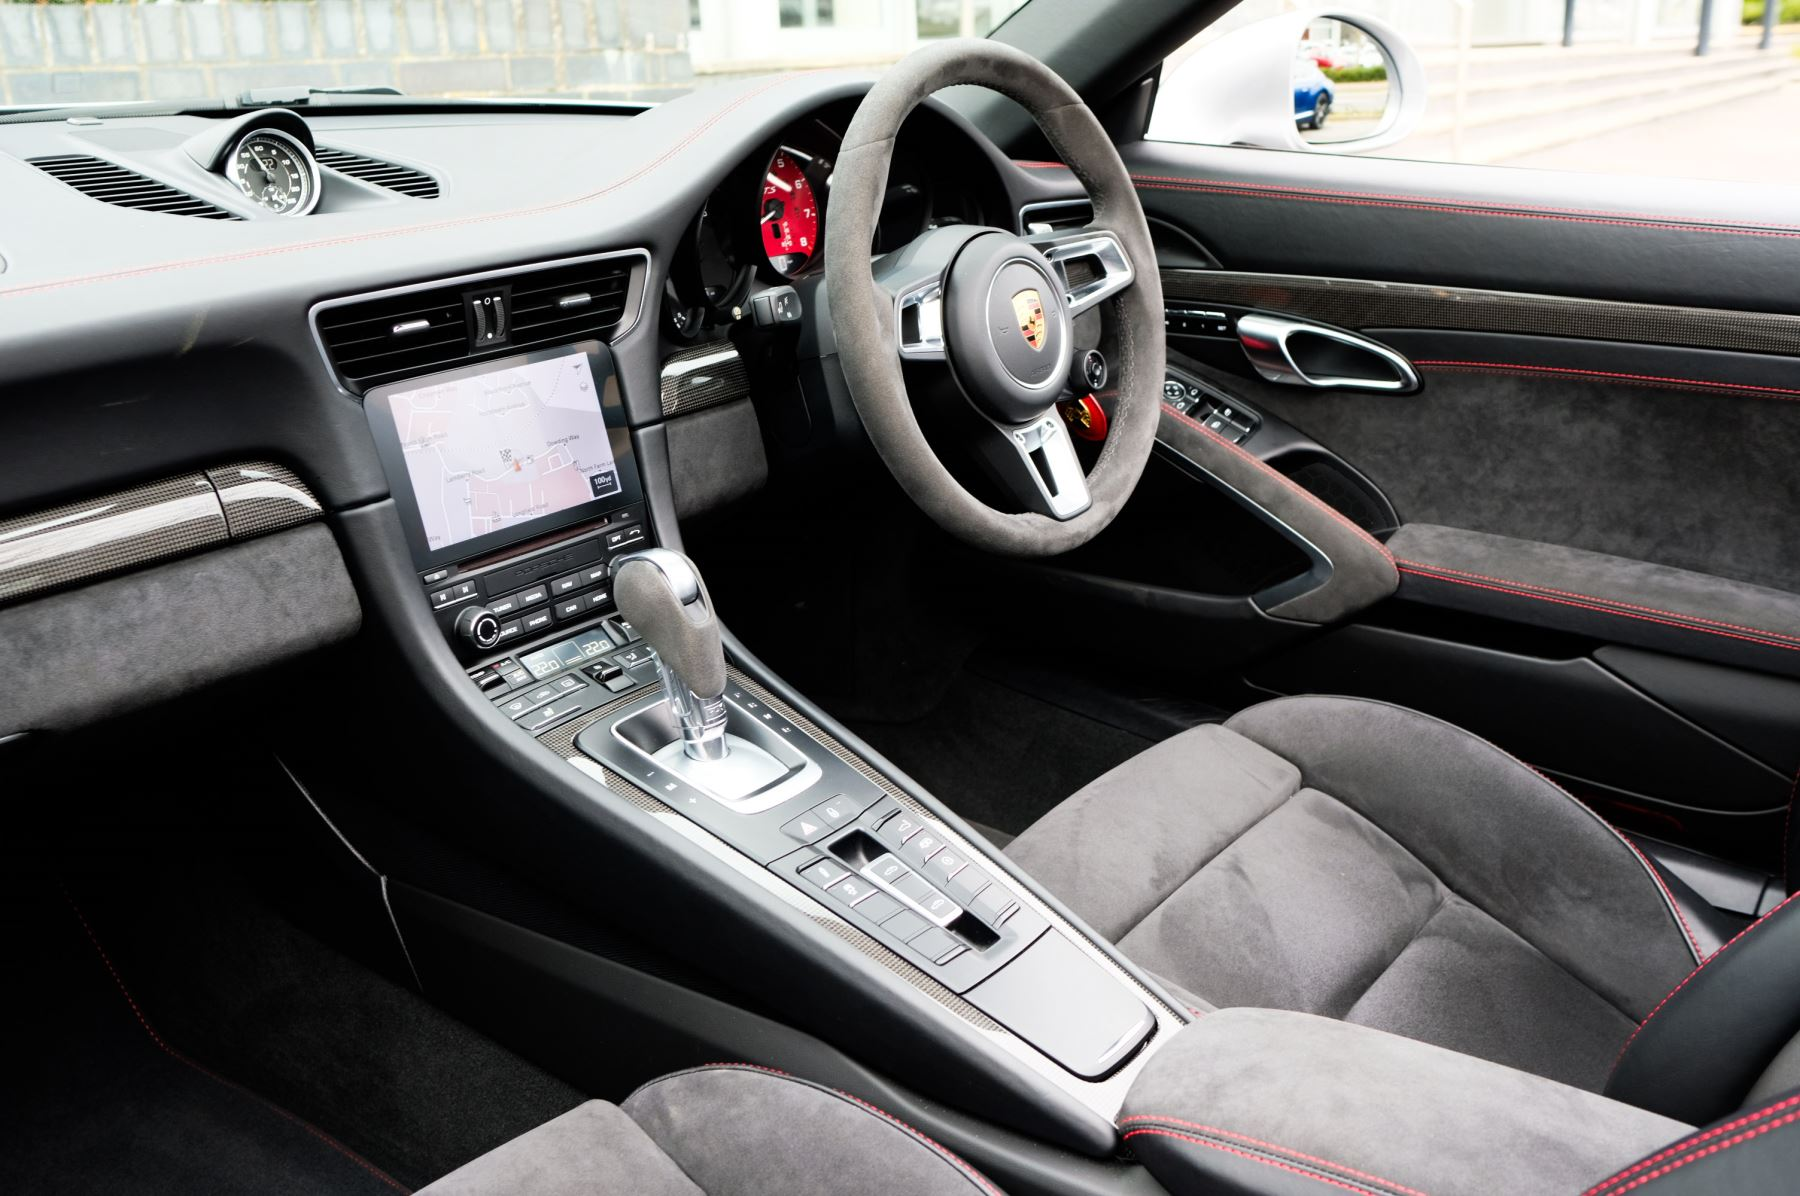 Porsche 911 TARGA 4 GTS - PDK - SPORT DESIGN PACKAGE - GTS INTERIOR PACKAGE image 20